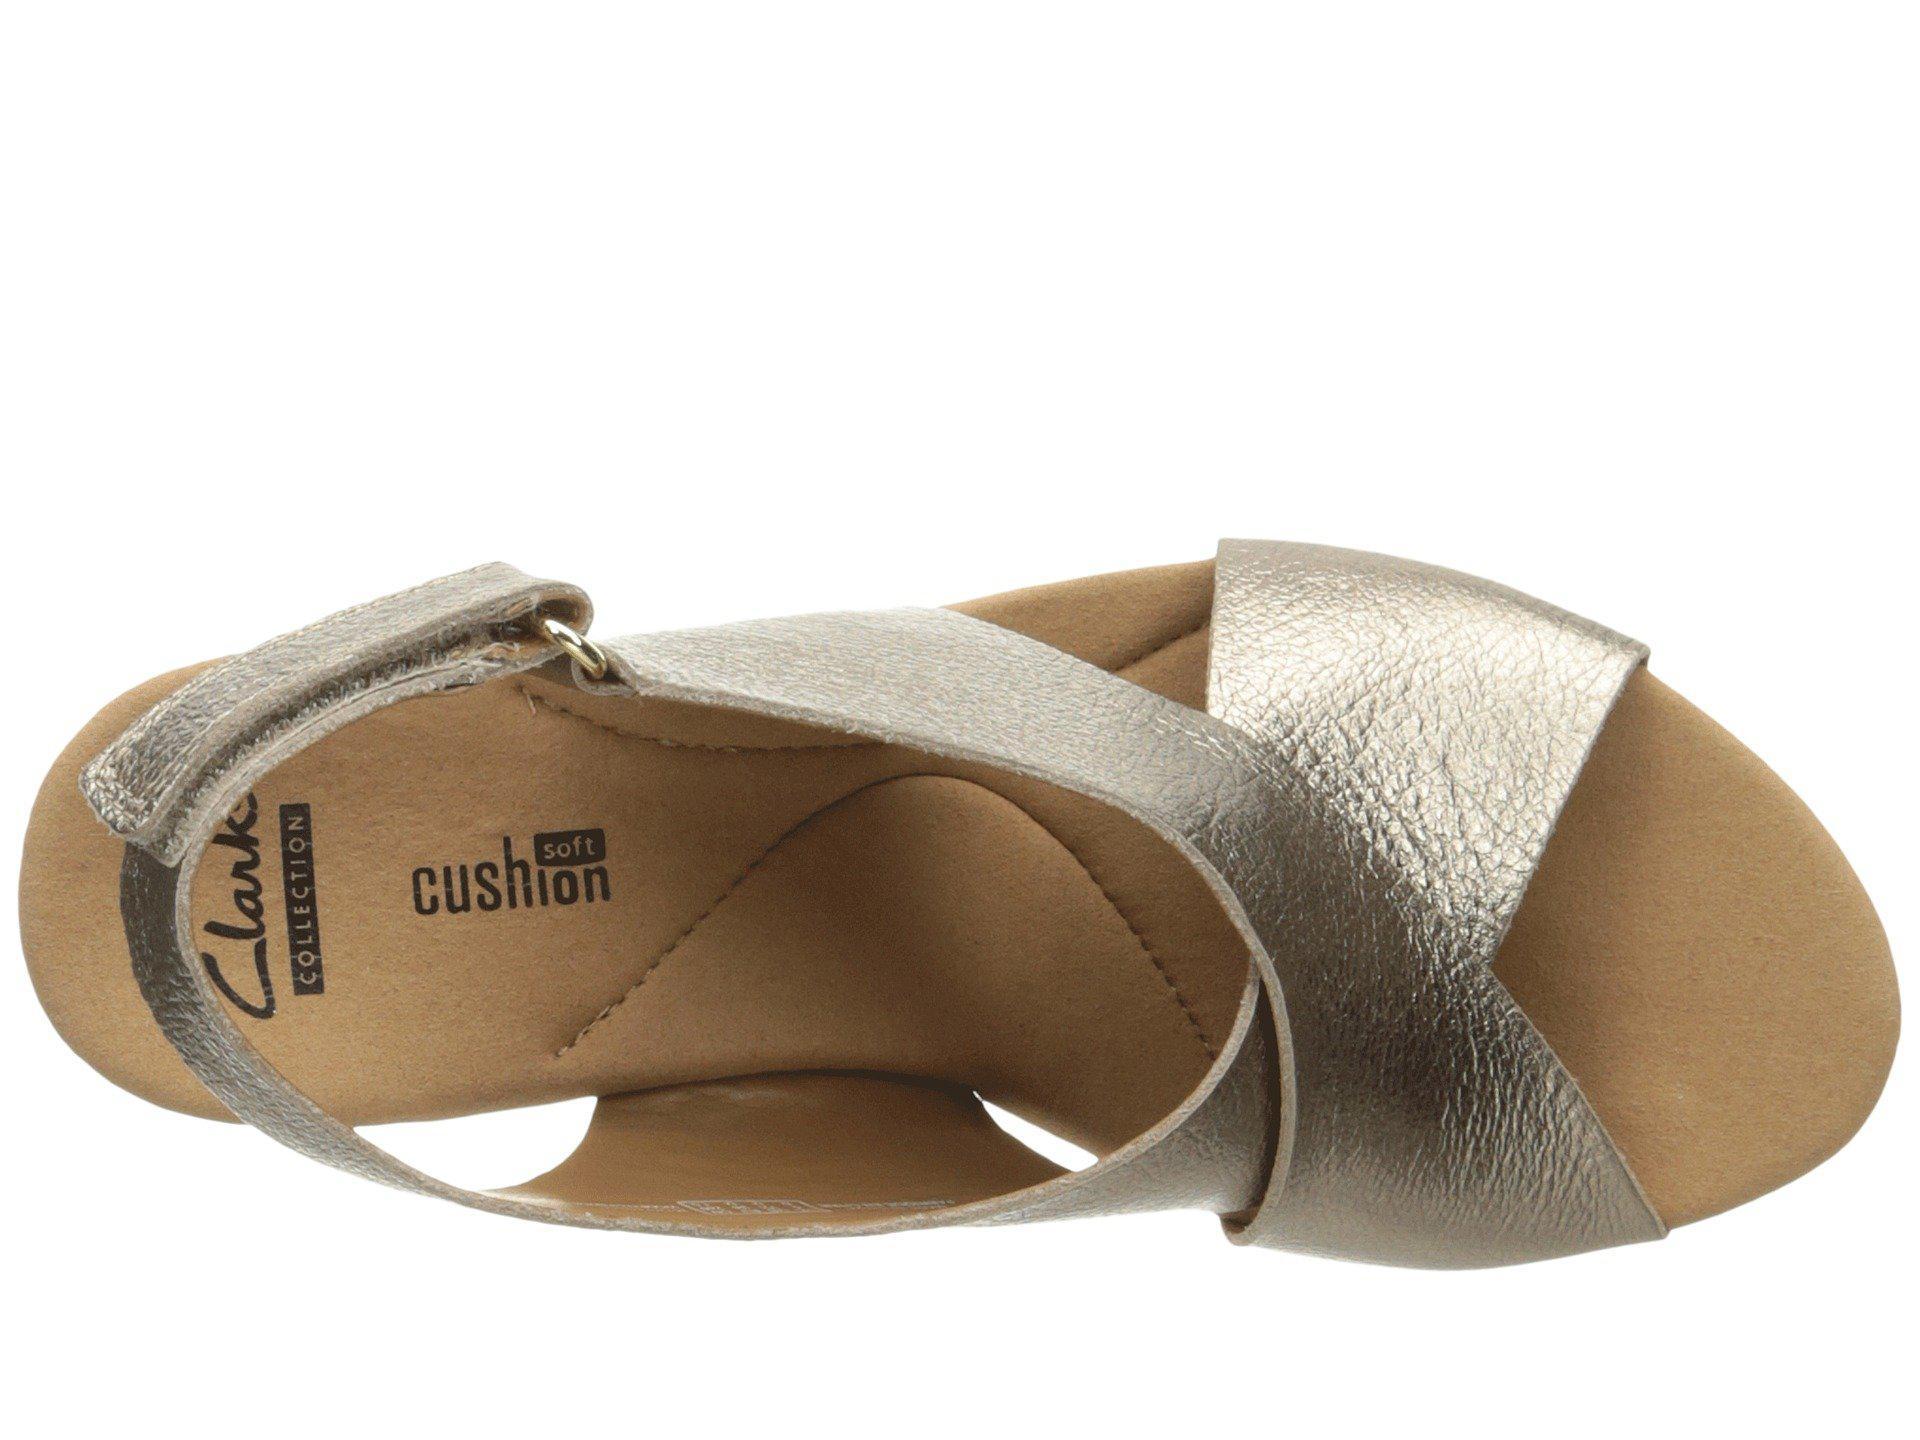 b54aaf94ba4f Clarks - Metallic Annadel Eirwyn (white Leather) Women s Sandals - Lyst.  View fullscreen